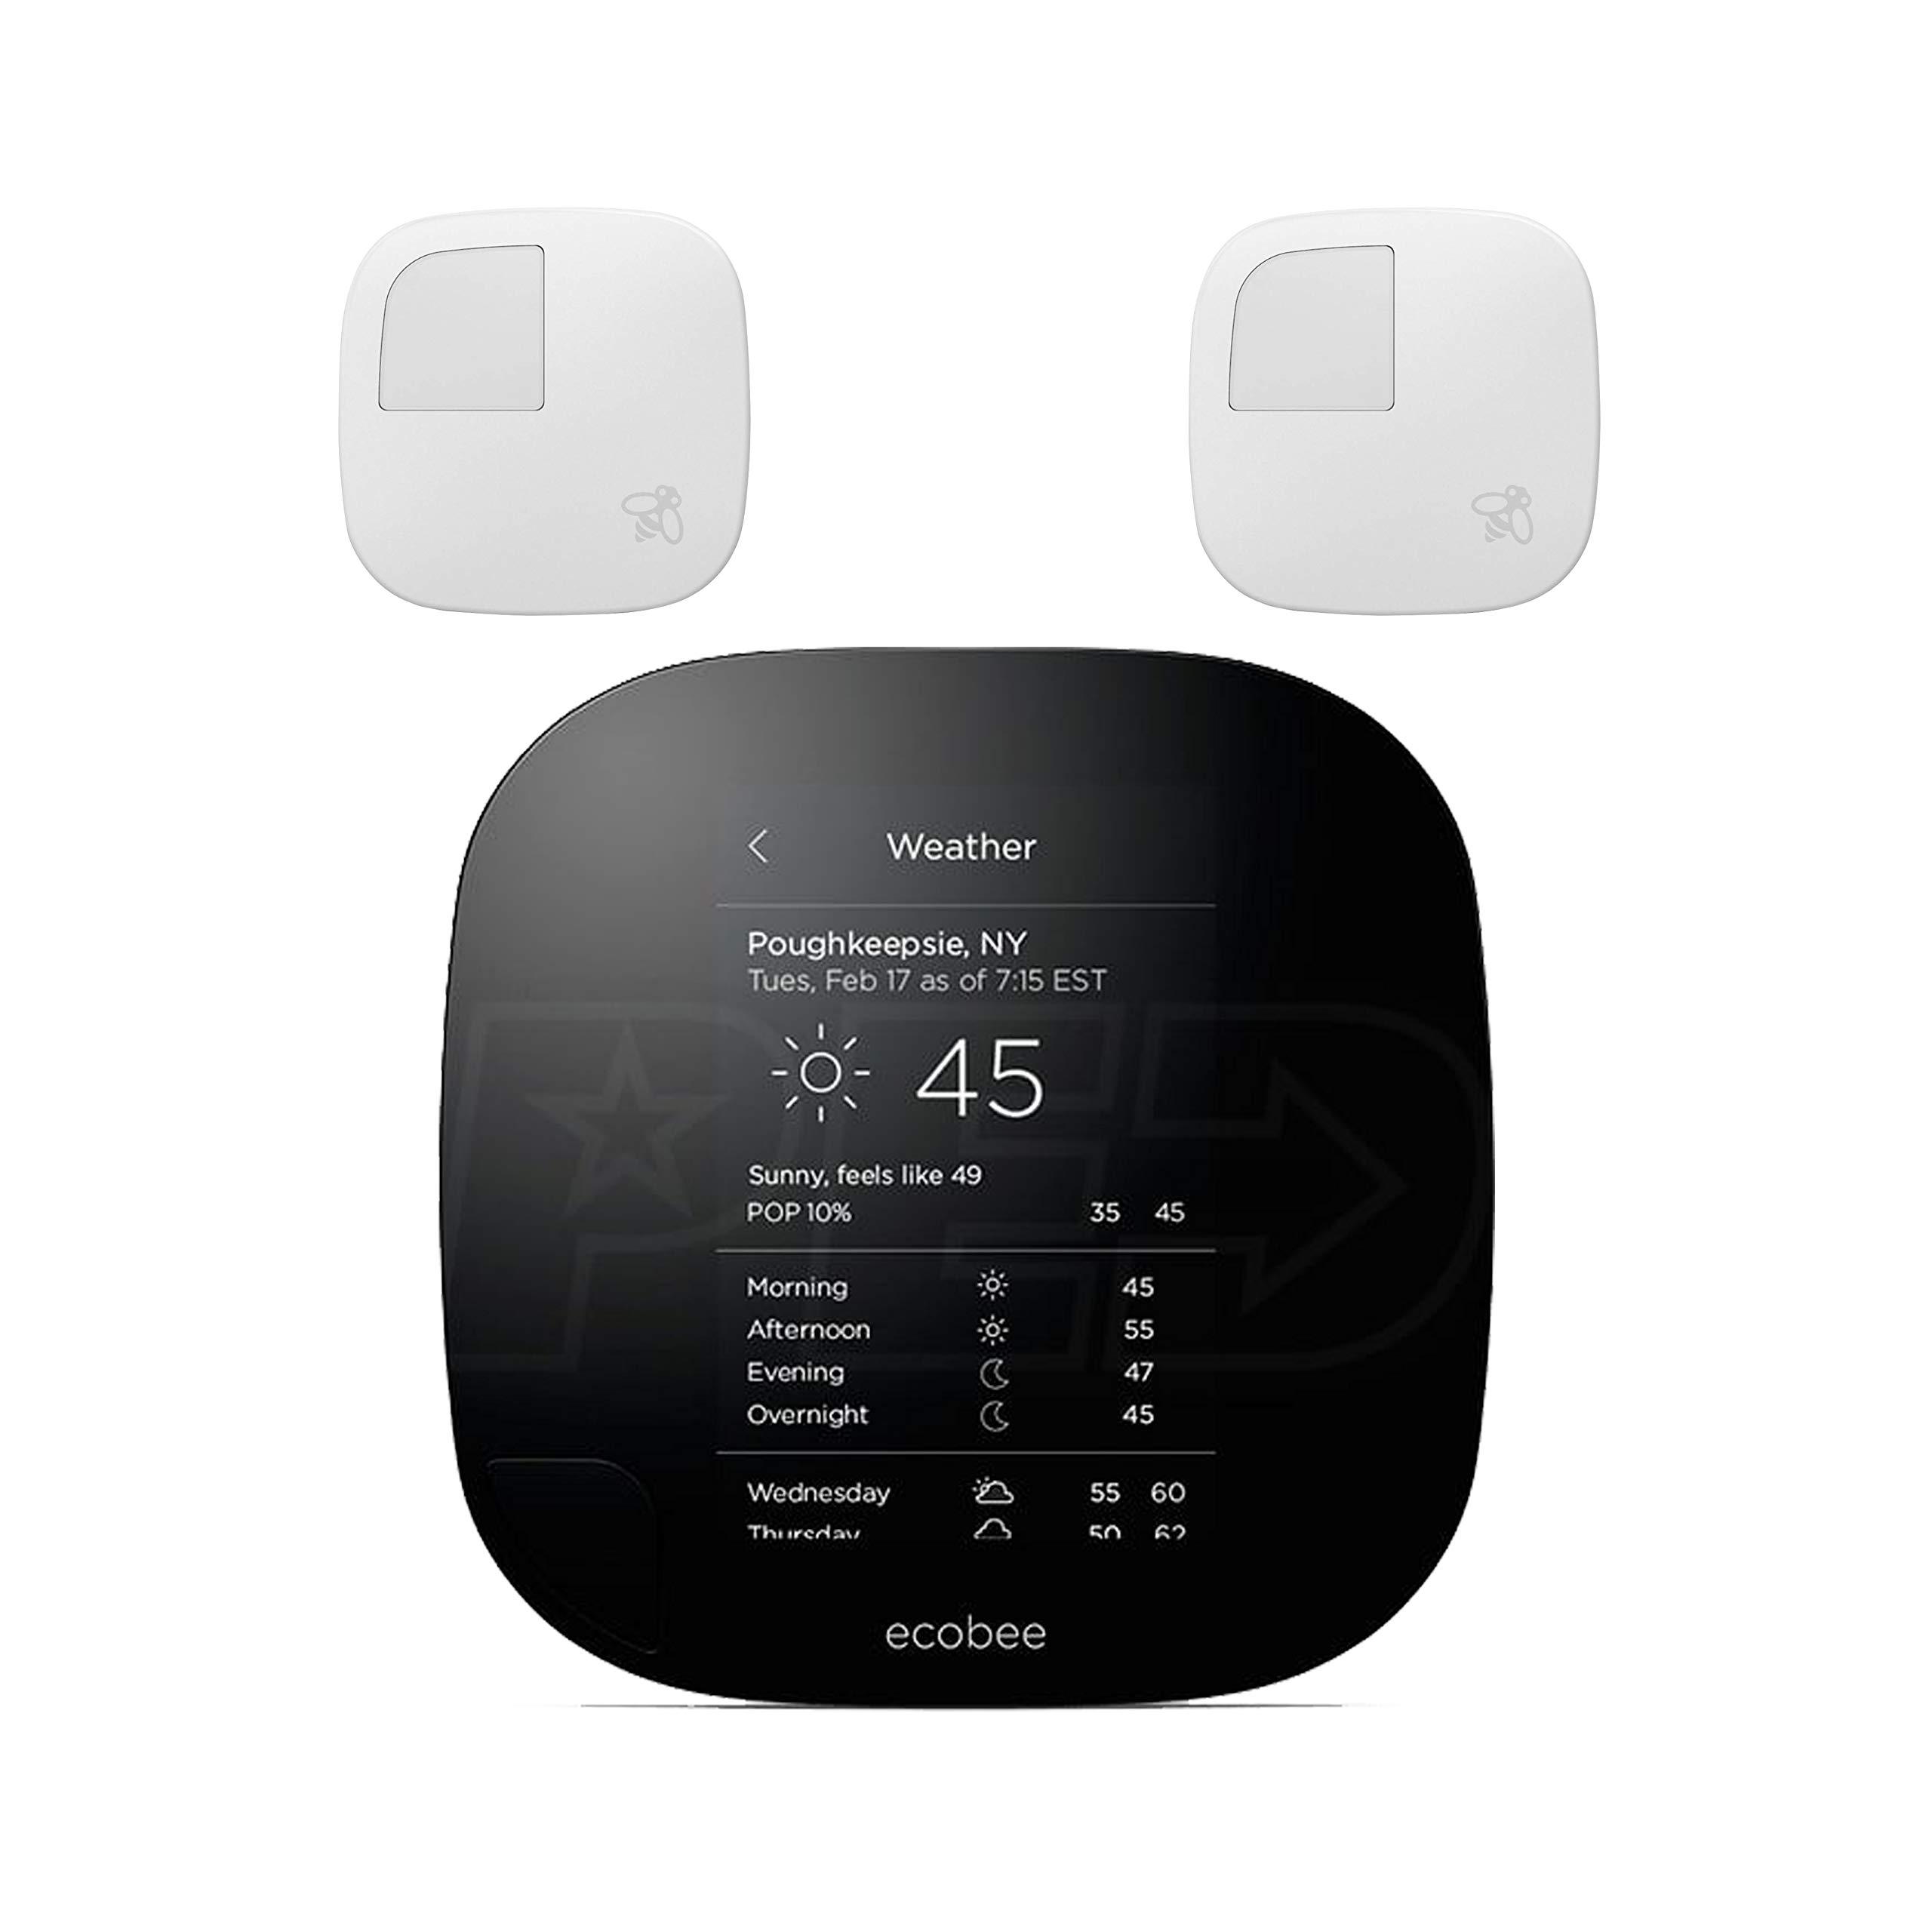 ecobee 3 Lite Smart Thermostat 2nd Gen with 2 Room Sensors